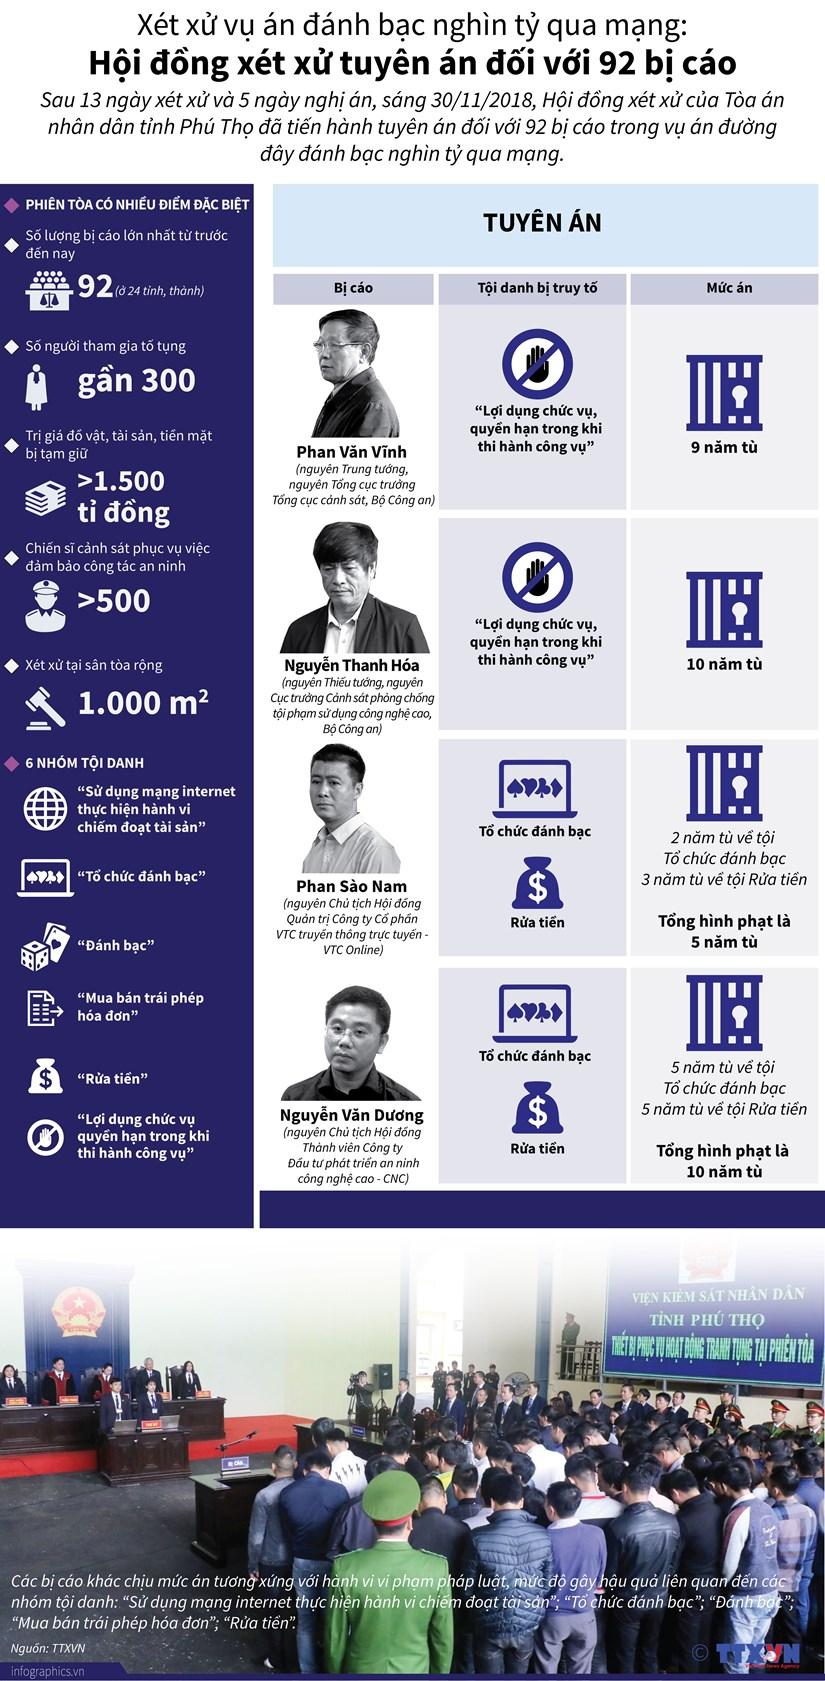 [Infographics] Muc an doi voi cac bi cao trong vu danh bac nghin ty hinh anh 1